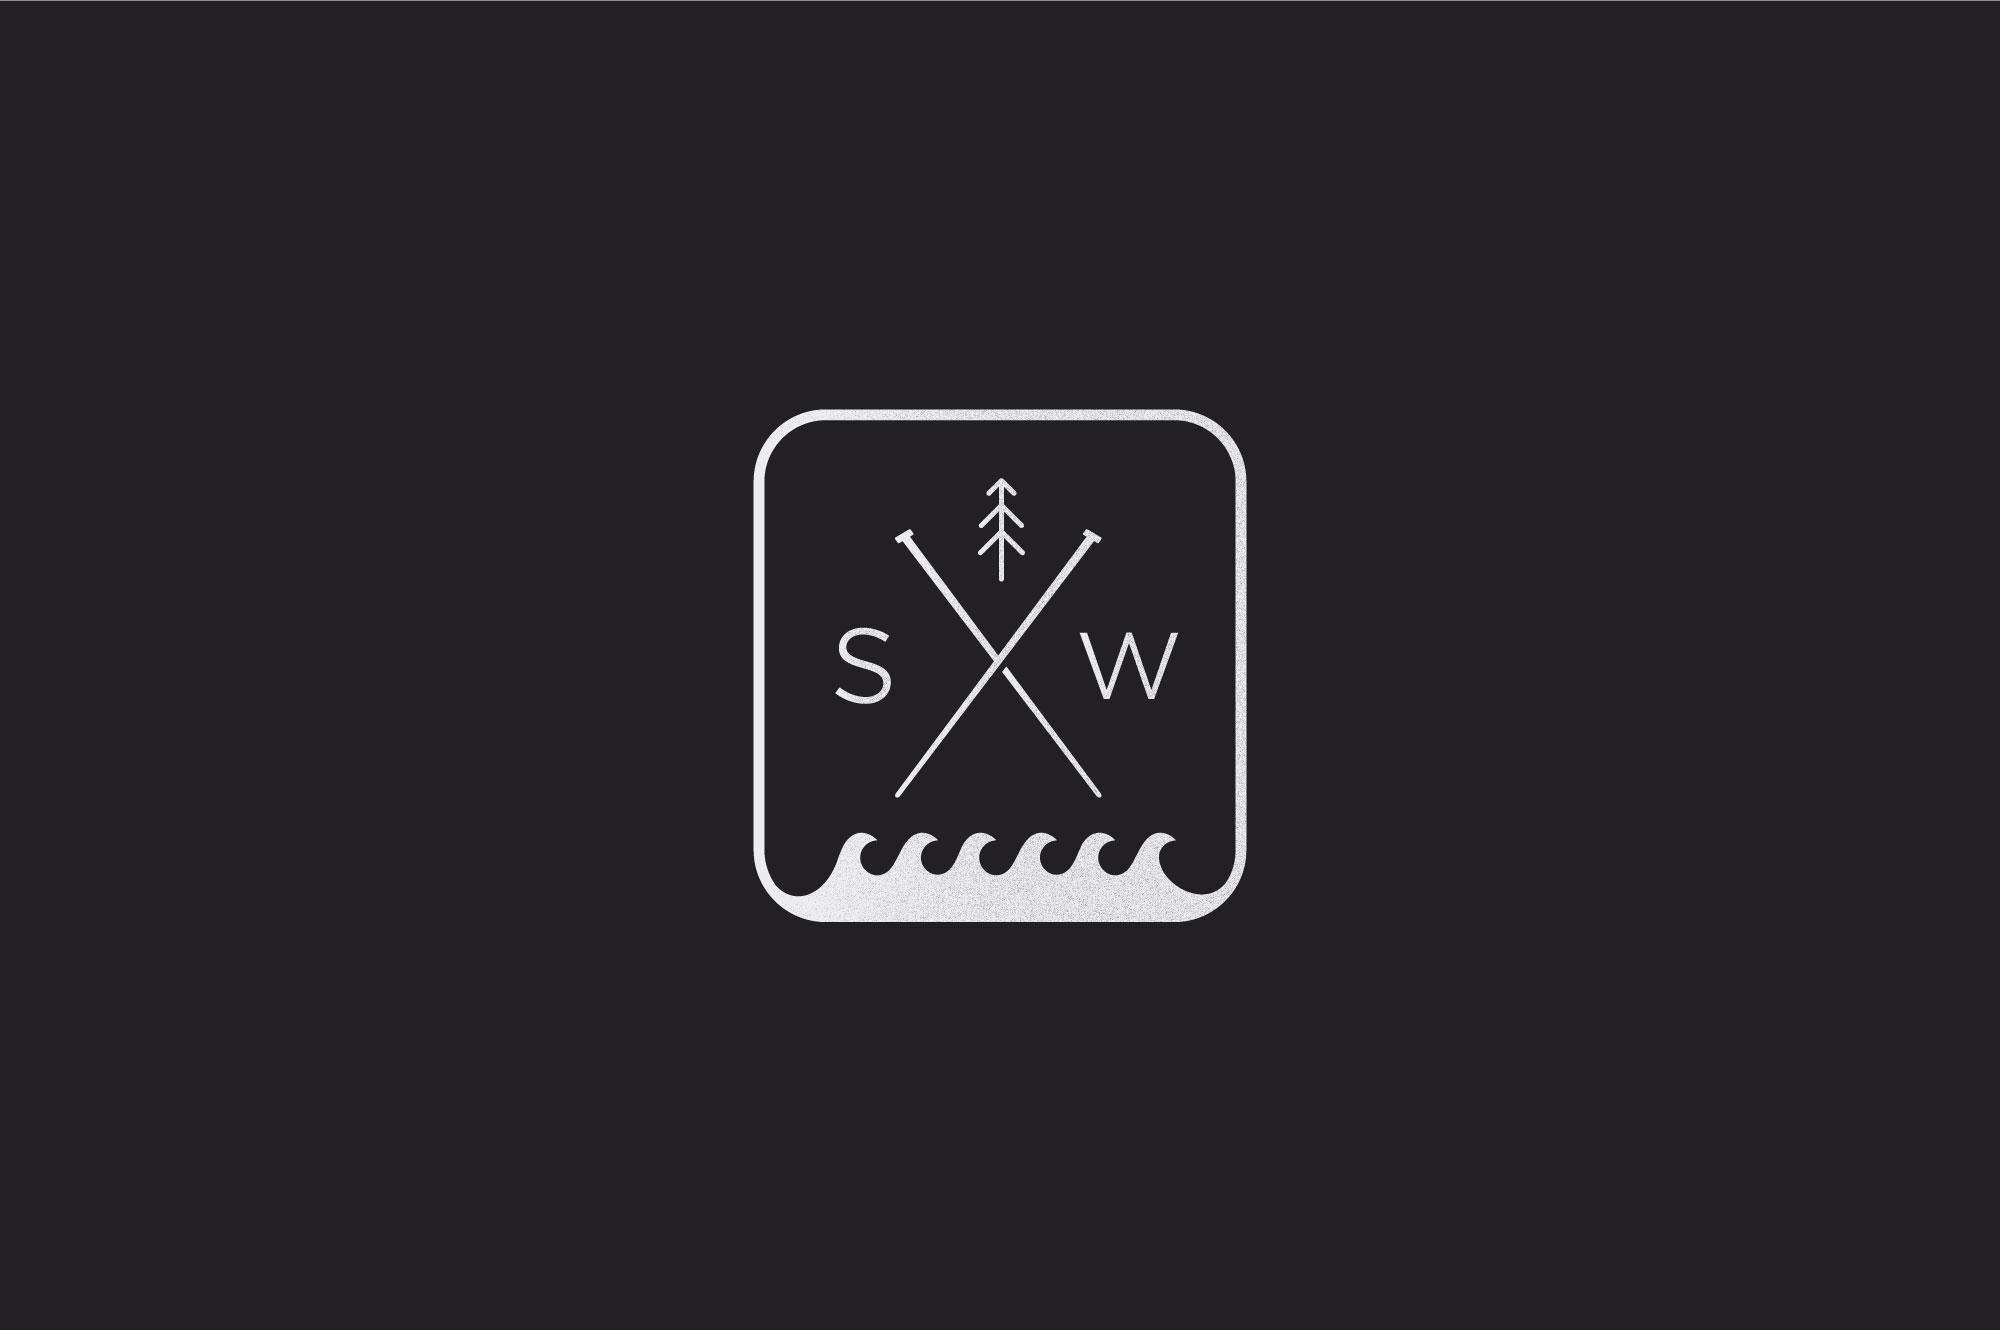 Salt&Wool_1.jpg